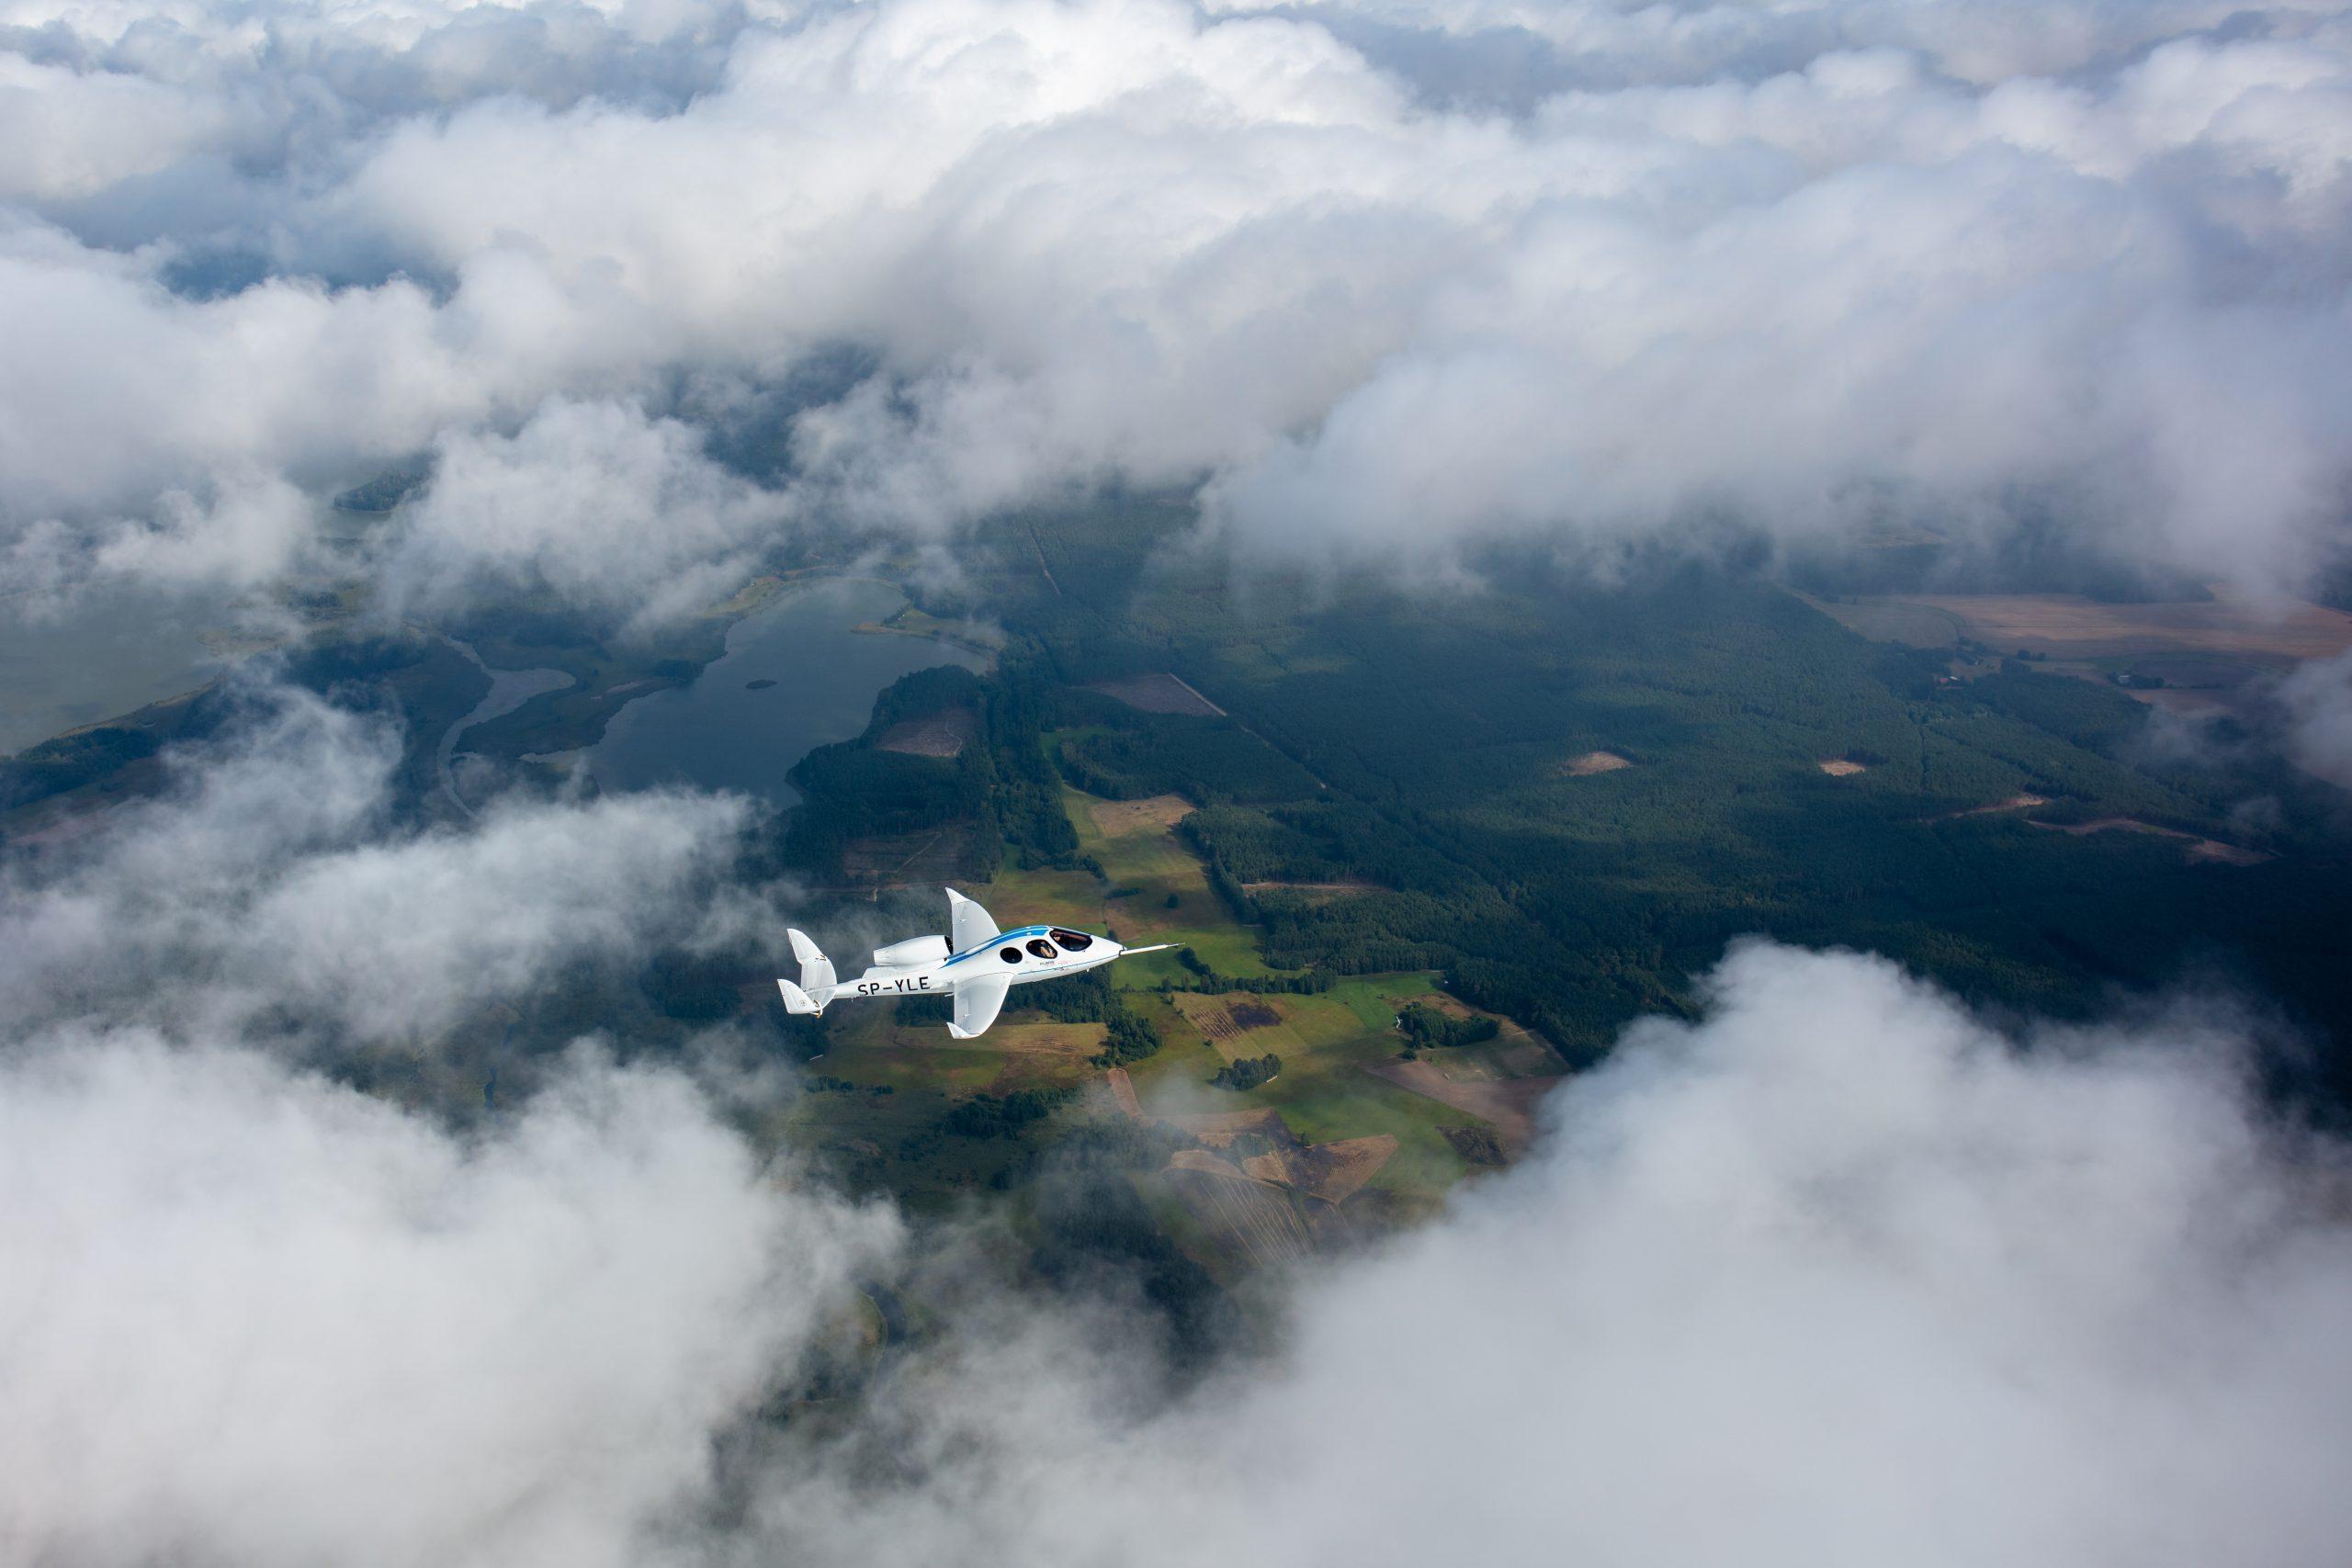 FLARIS LAR 1 MOVIE PREMIERE: JET TAKE OFF, FLIGHT, AND LANDING